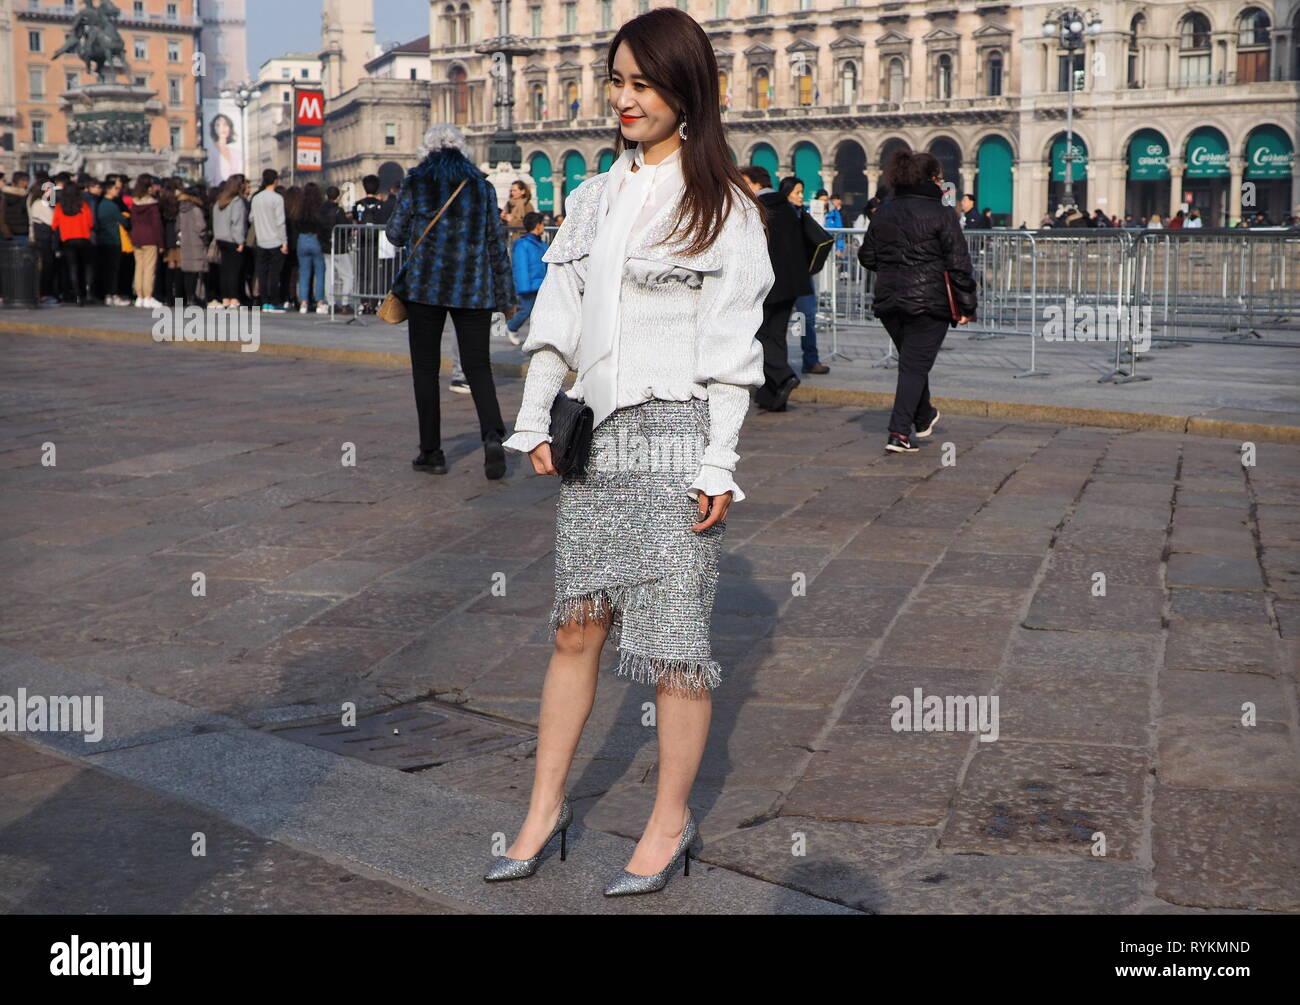 Milano, Piazza Duomo - Stock Image